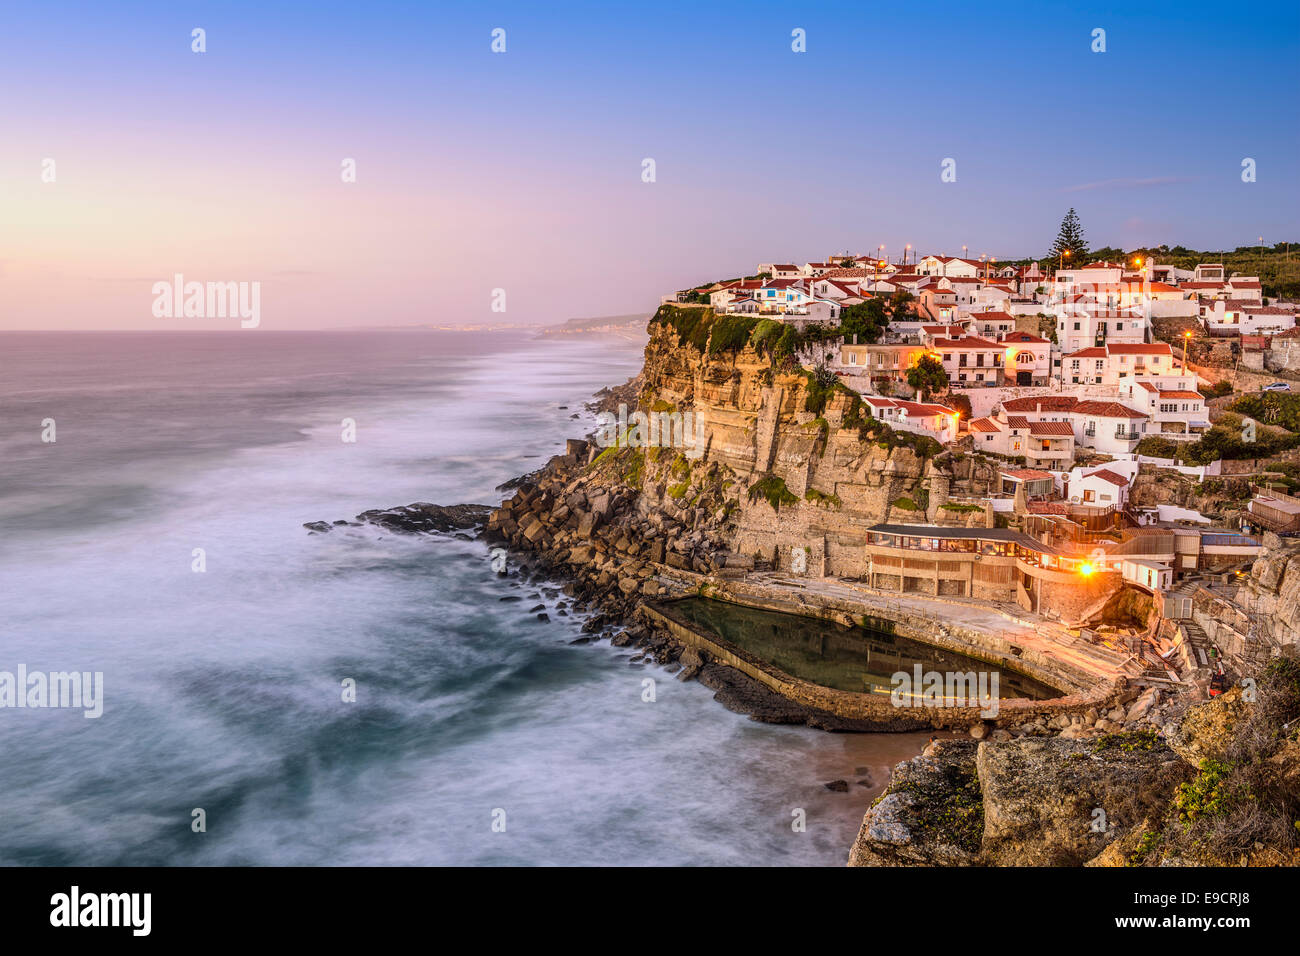 Azenhas Do Mar, Sintra, Portugal Stadtbild an der Küste. Stockbild